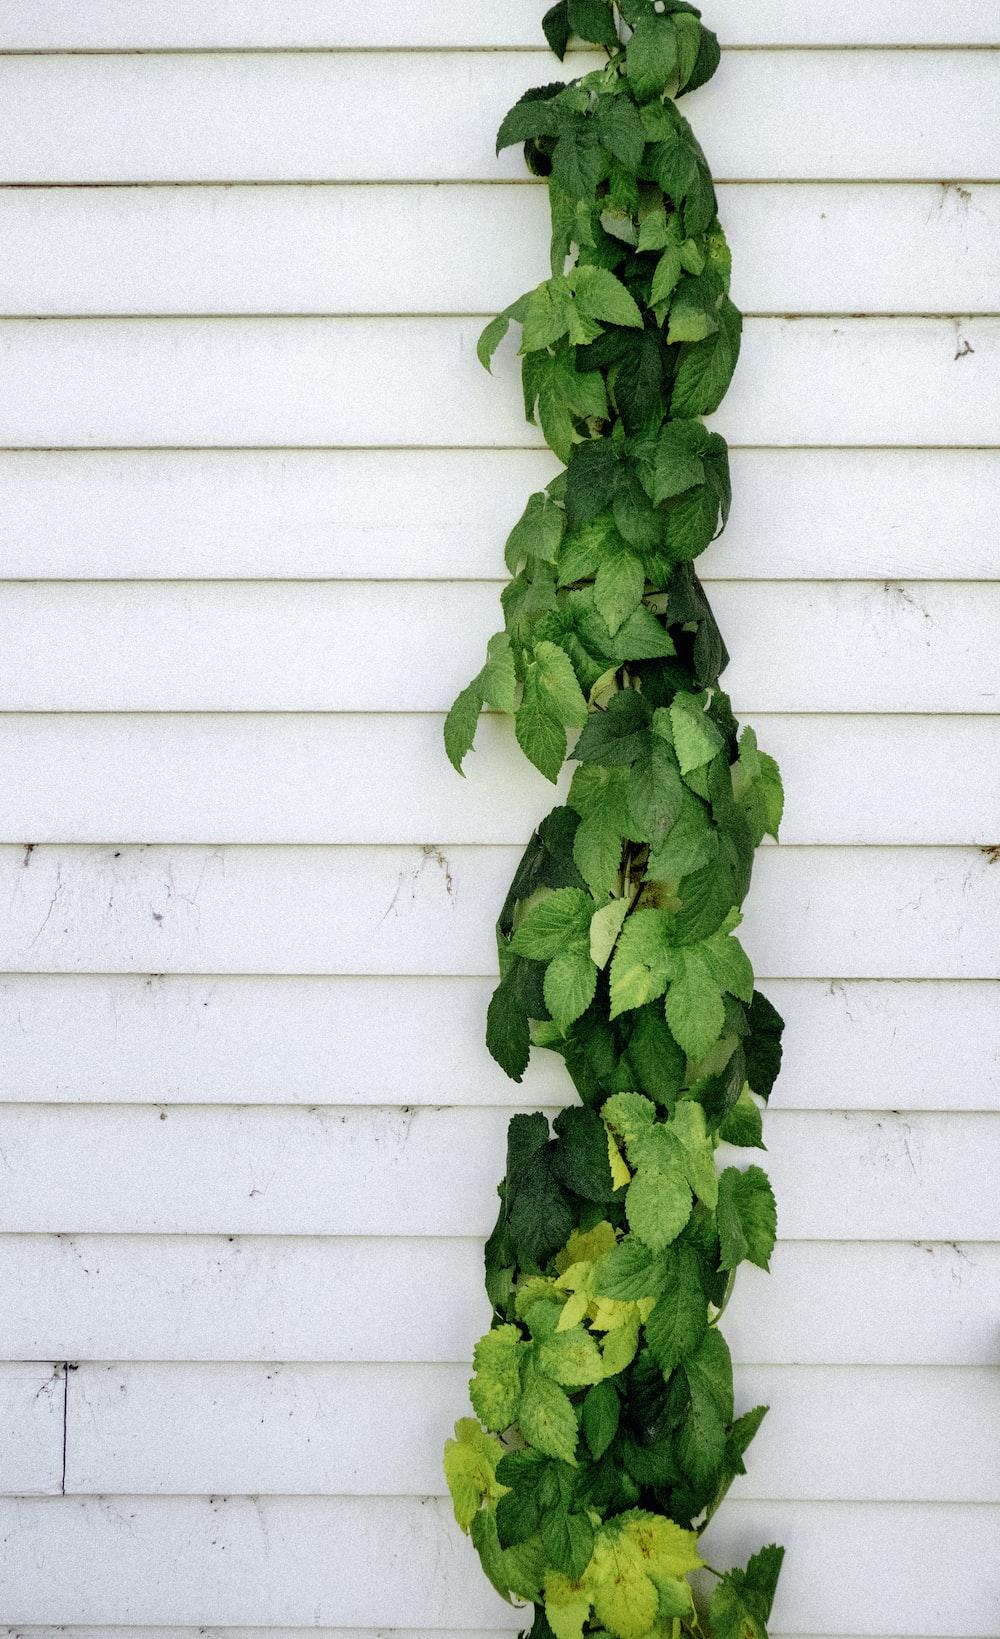 green vine plant near wall